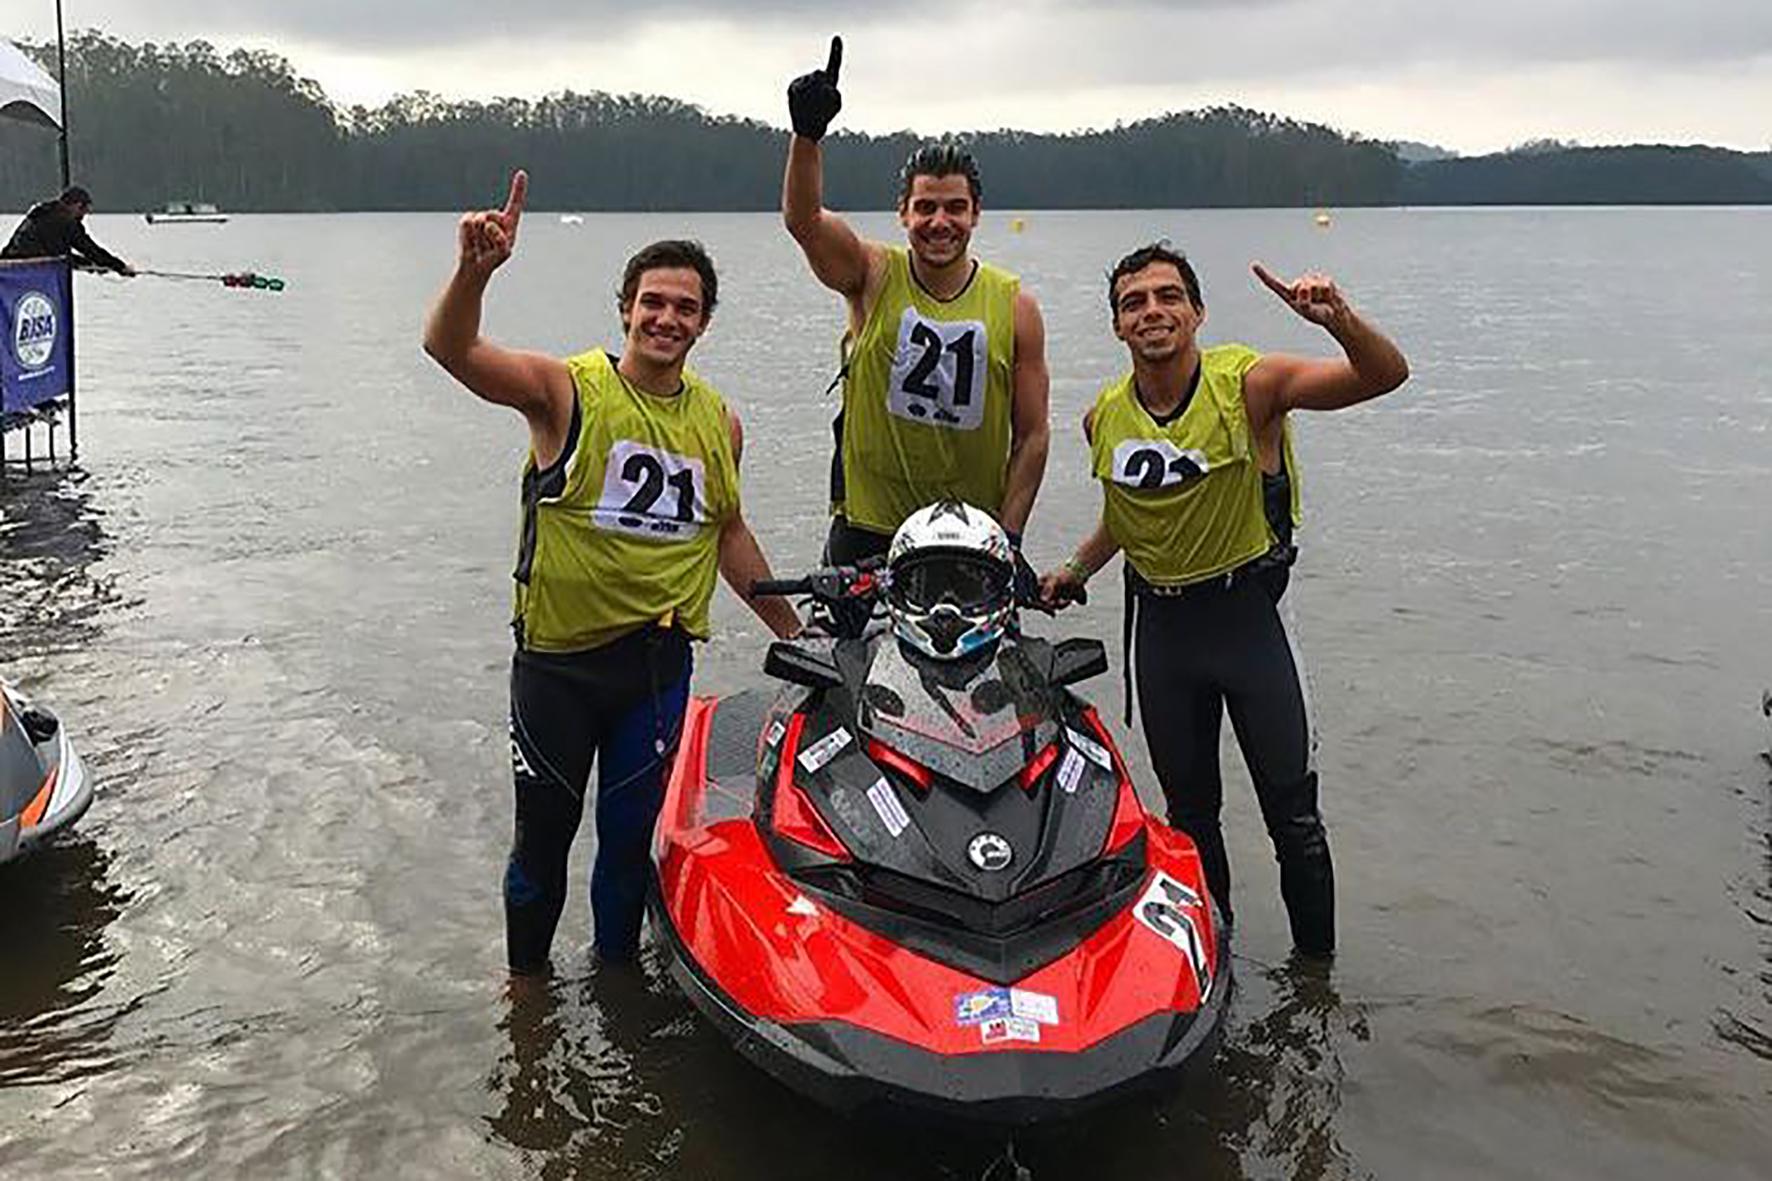 Bruno Varella, Daniel Tocchini e Allan Laffront (da esq. para dir.) com a moto aquática Sea-Doo RXP-X 300 Crédito: Divulgação